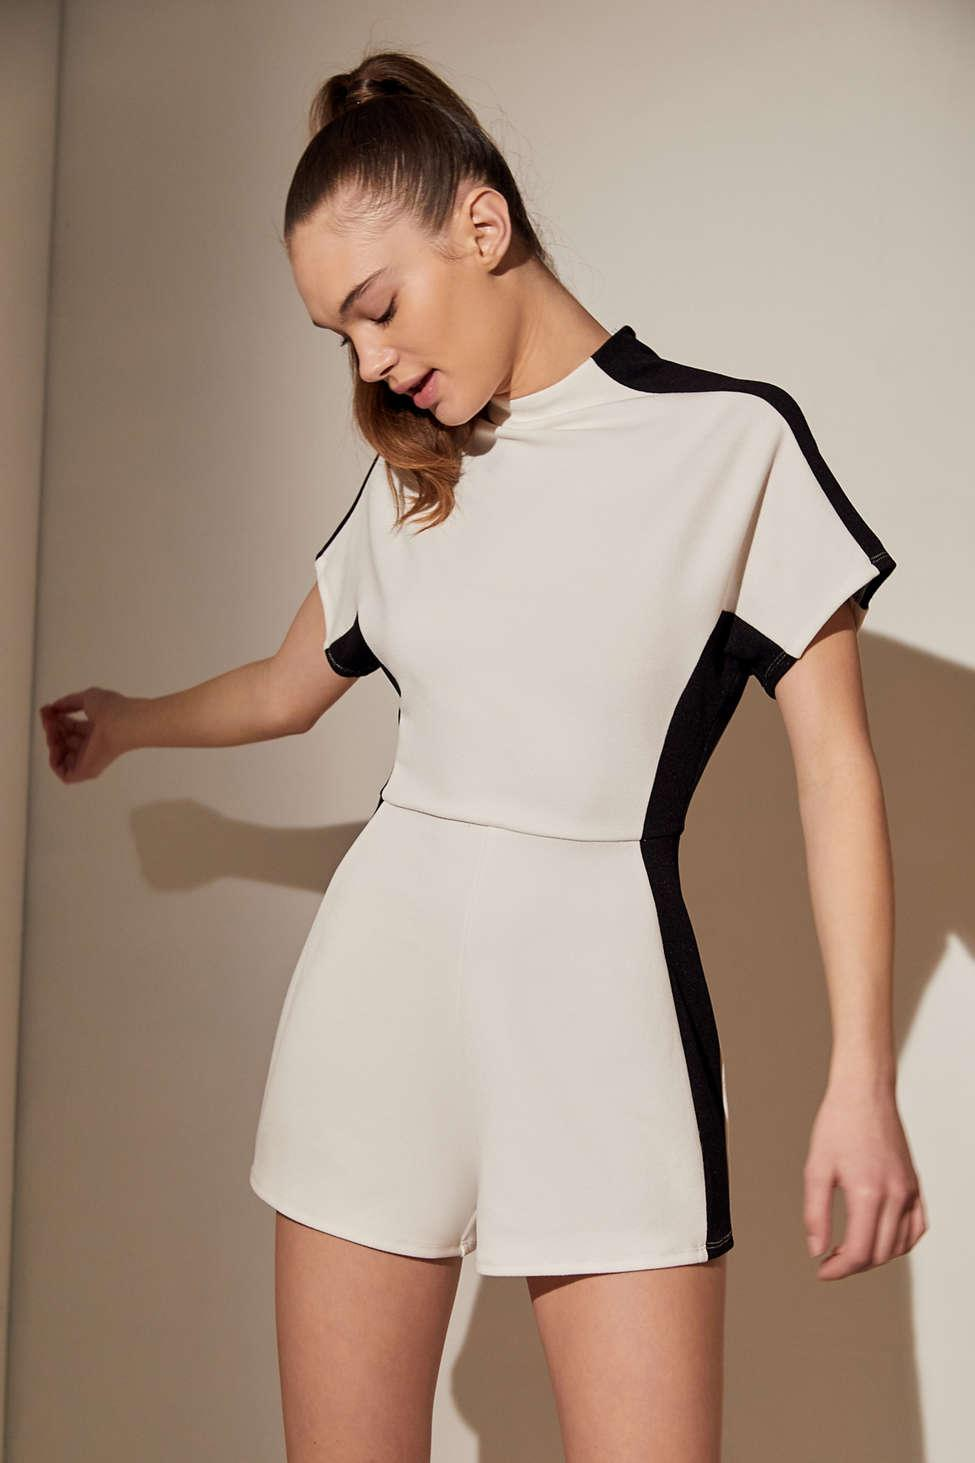 6b97dd04206 Urban Outfitters. Women s Black Uo Modern Illusion Colorblock Mock Neck  Romper